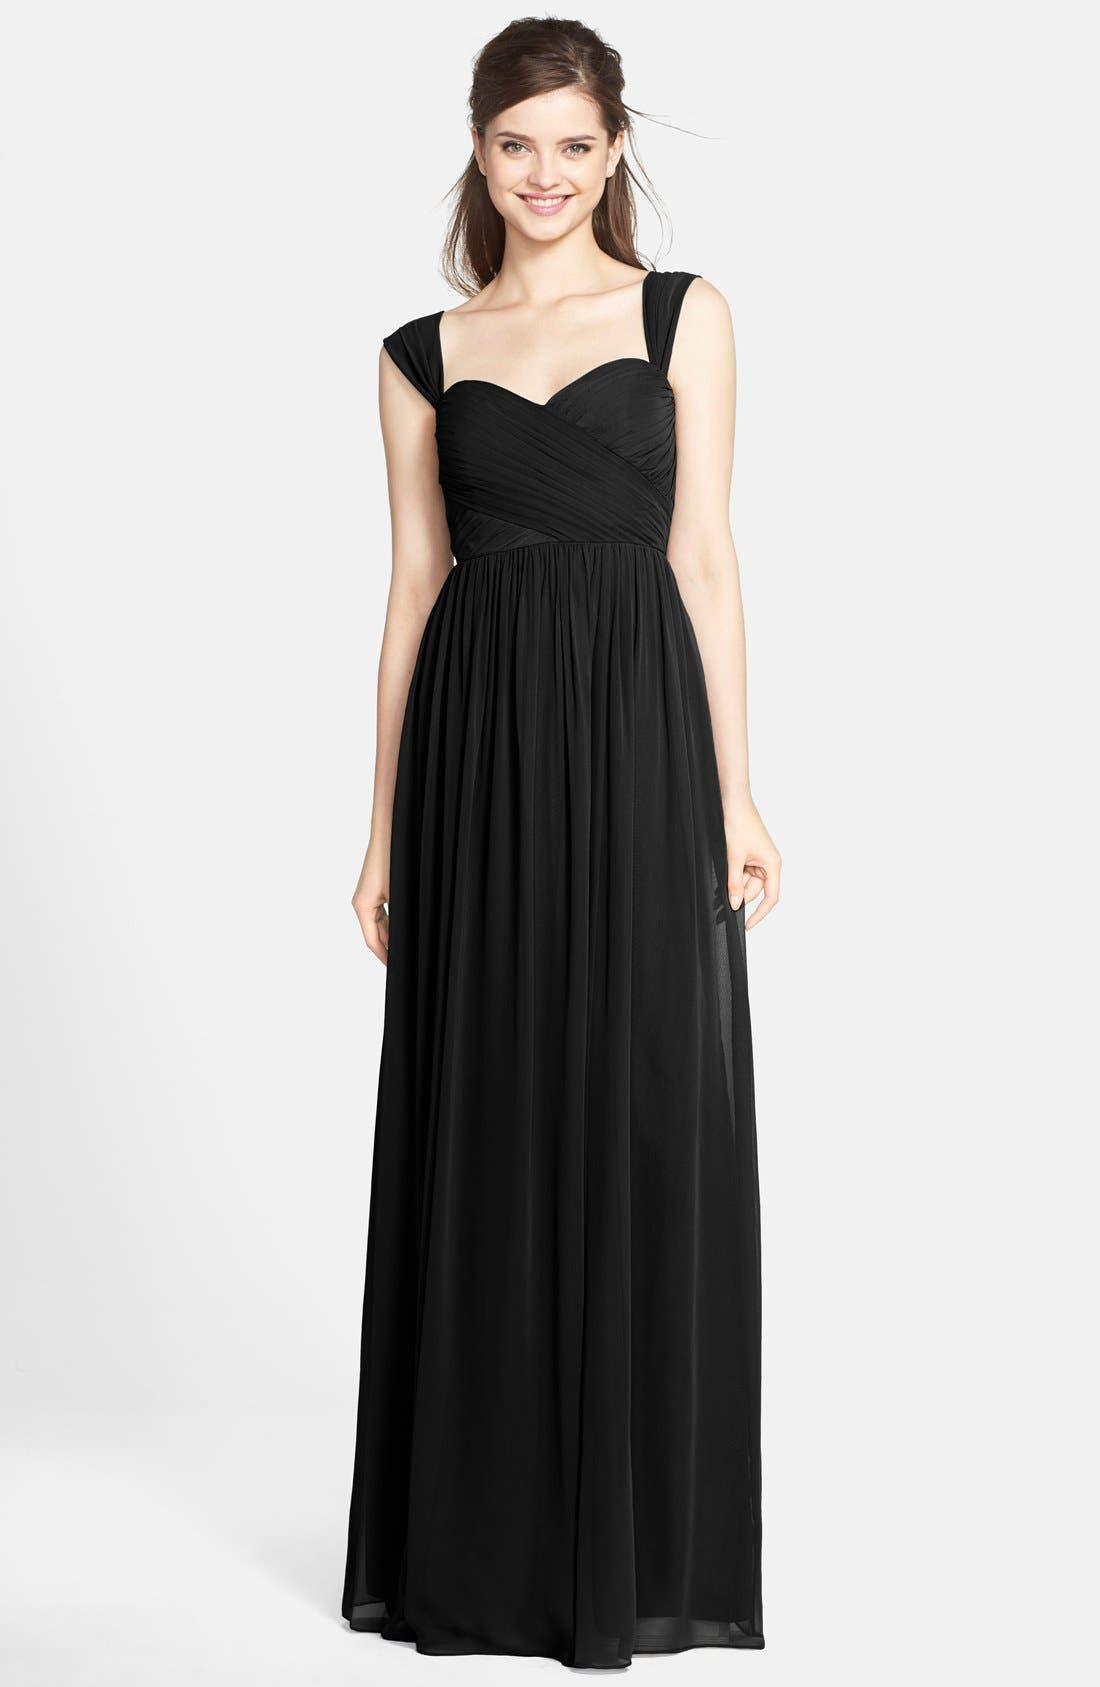 Alternate Image 1 Selected - Jenny Yoo 'Leah' Convertible Chiffon Gown